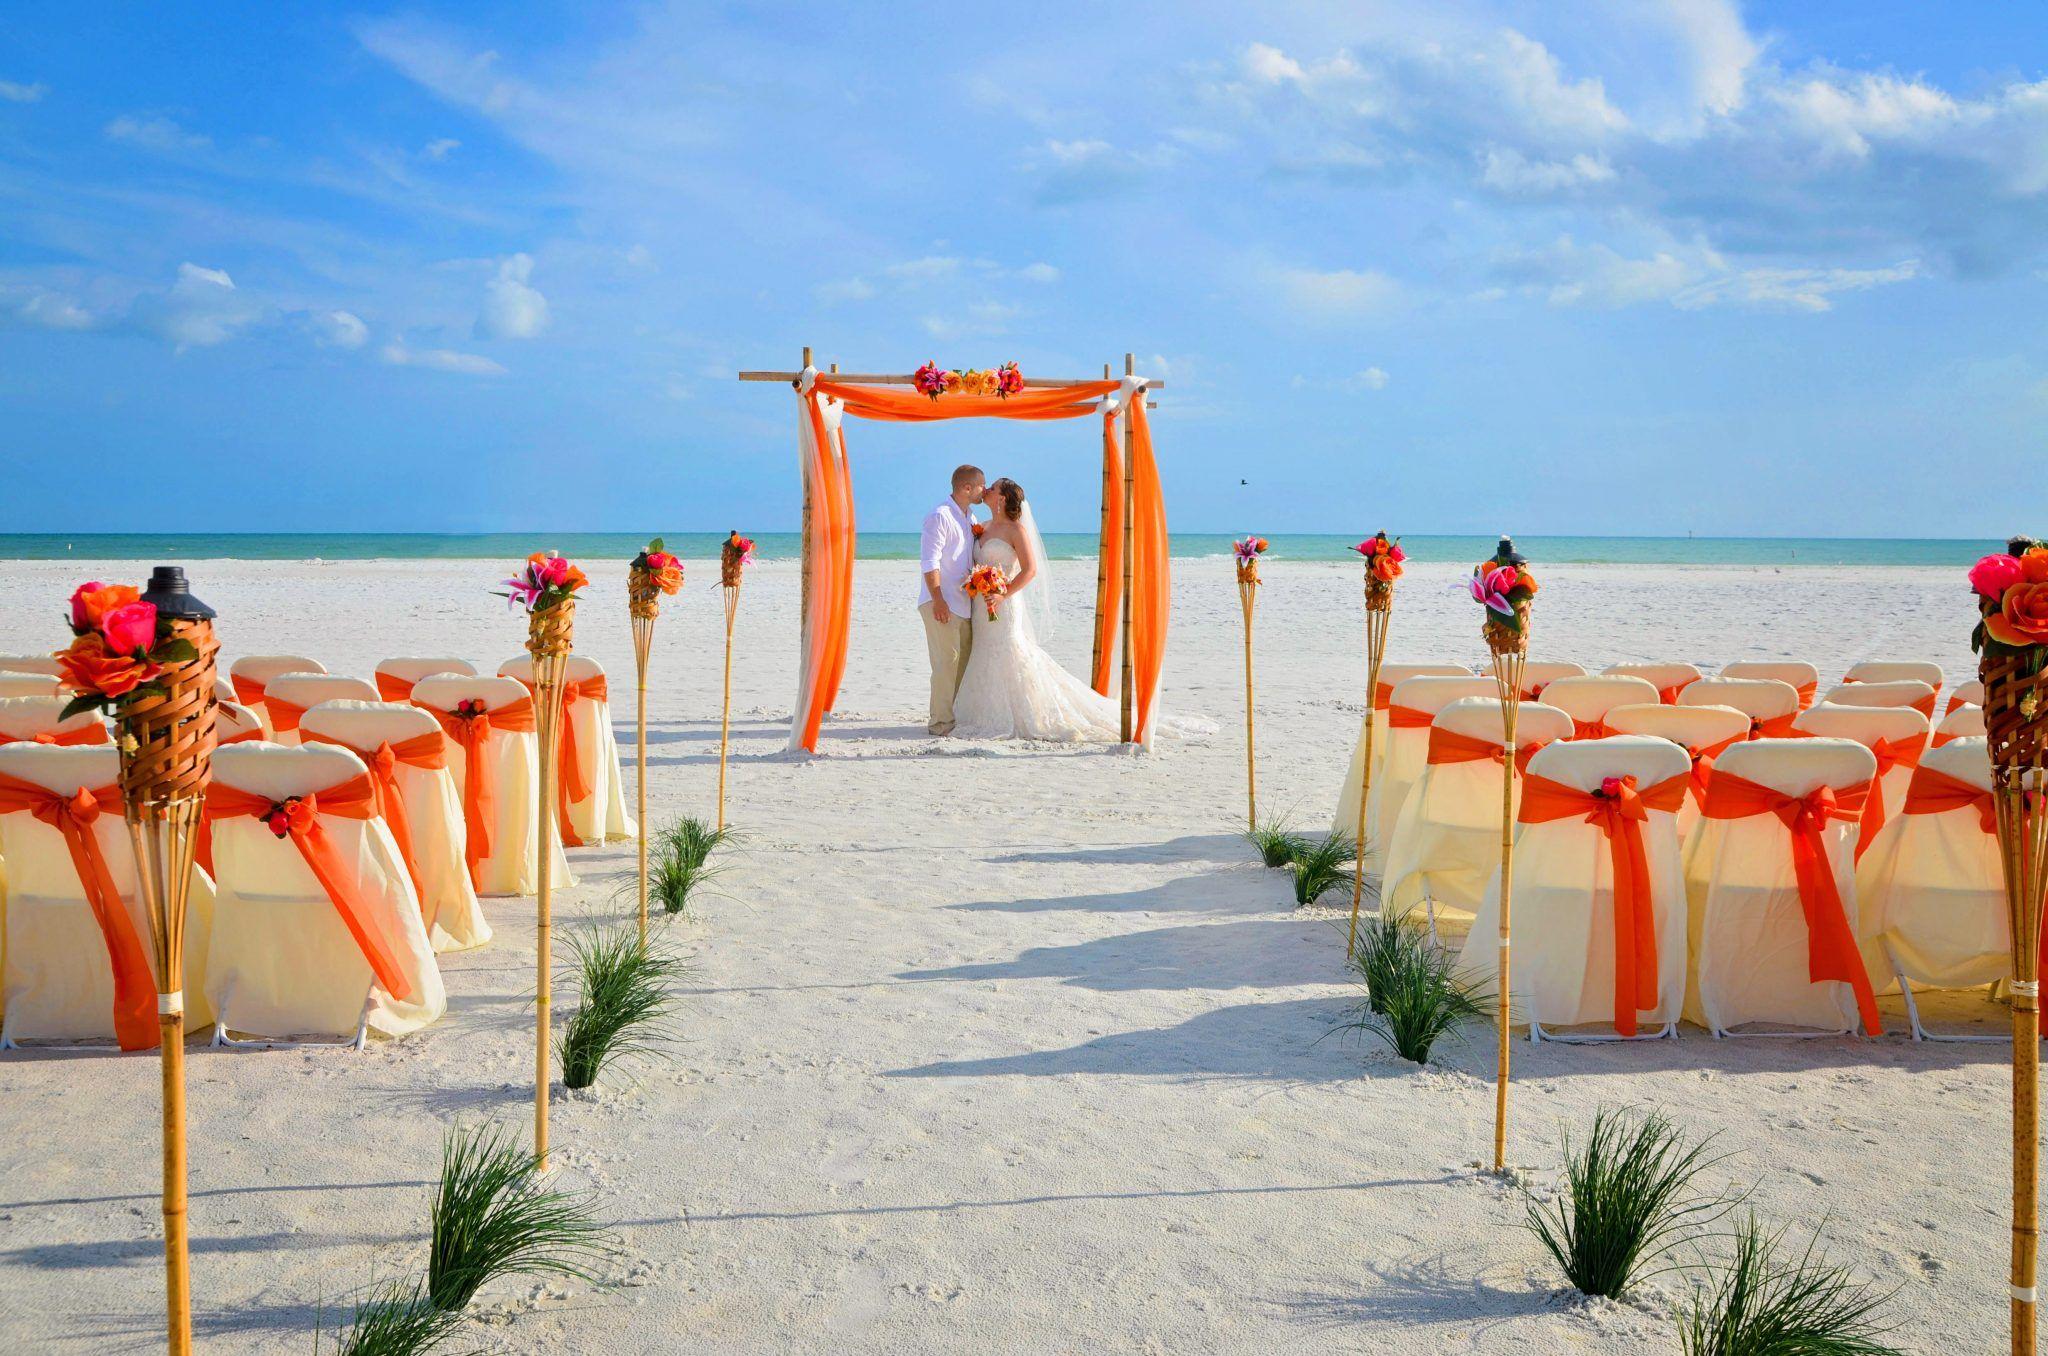 Florida Beach Weddings All Inclusive Destination Wedding Packages Beach Wedding Packages Florida Beach Wedding All Inclusive Destination Weddings